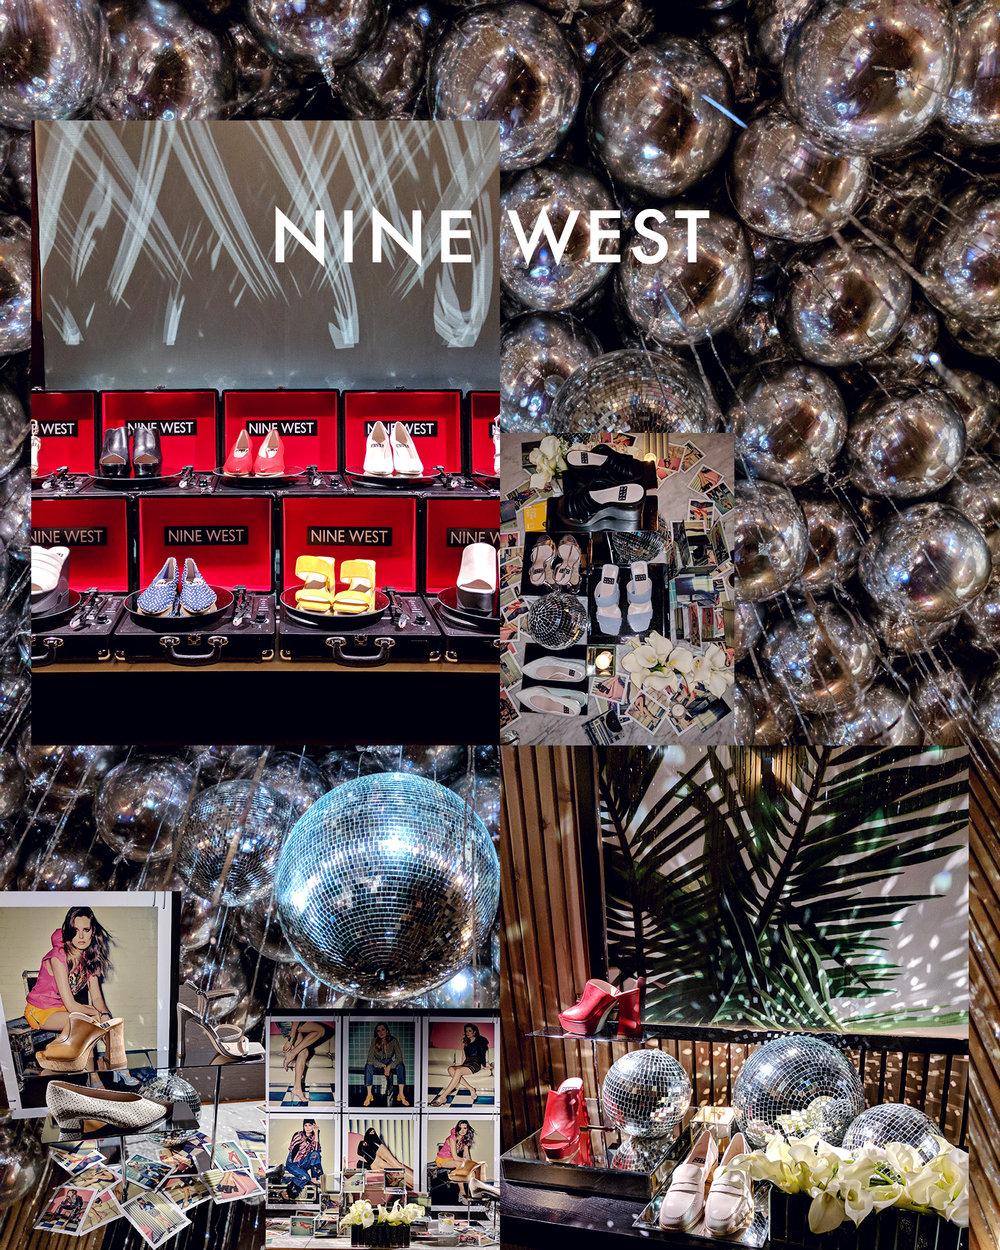 ninewest.jpg